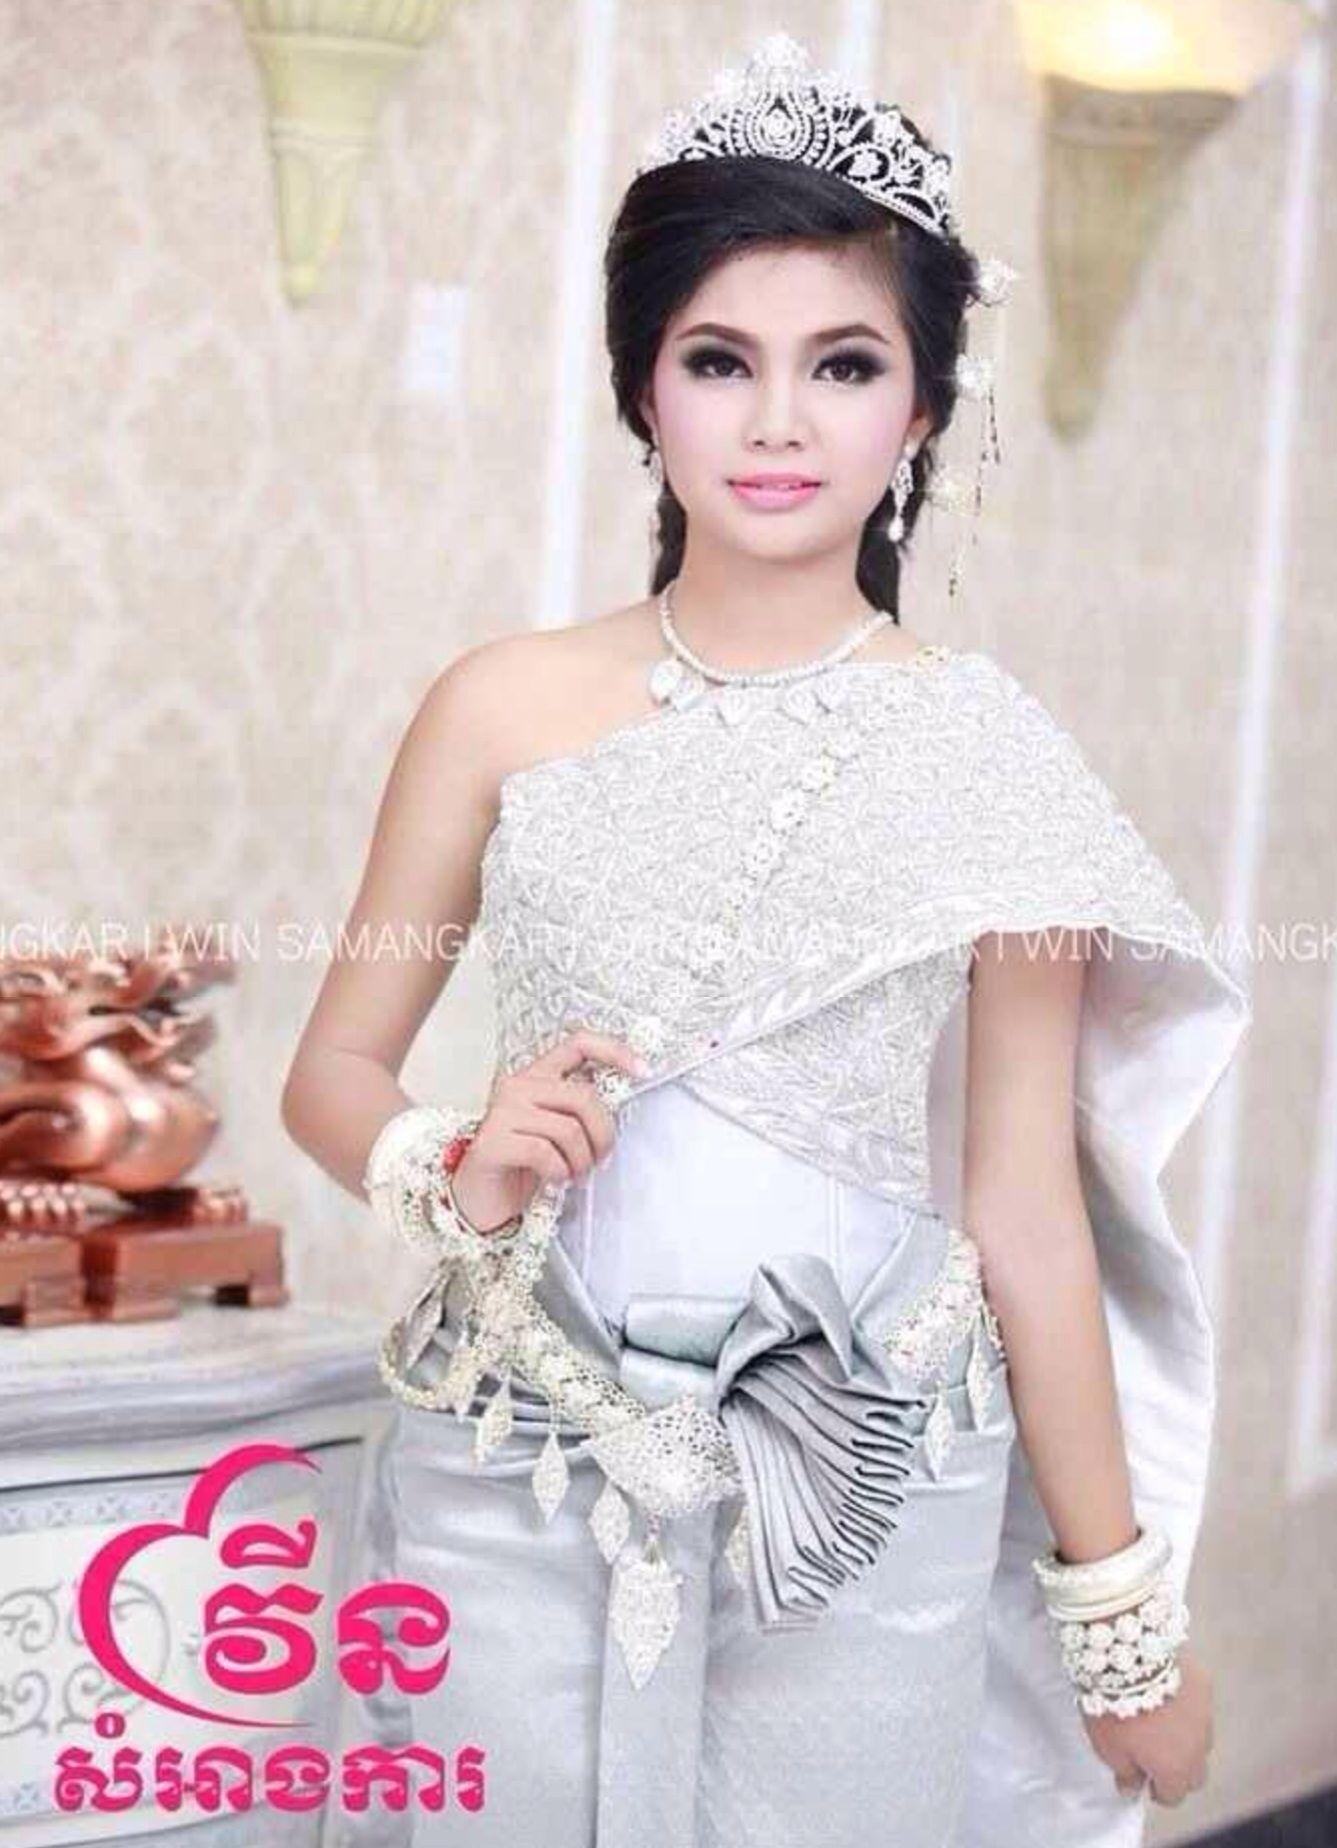 Khmer wedding dress   Wedding   Pinterest   Khmer wedding, Thai ...